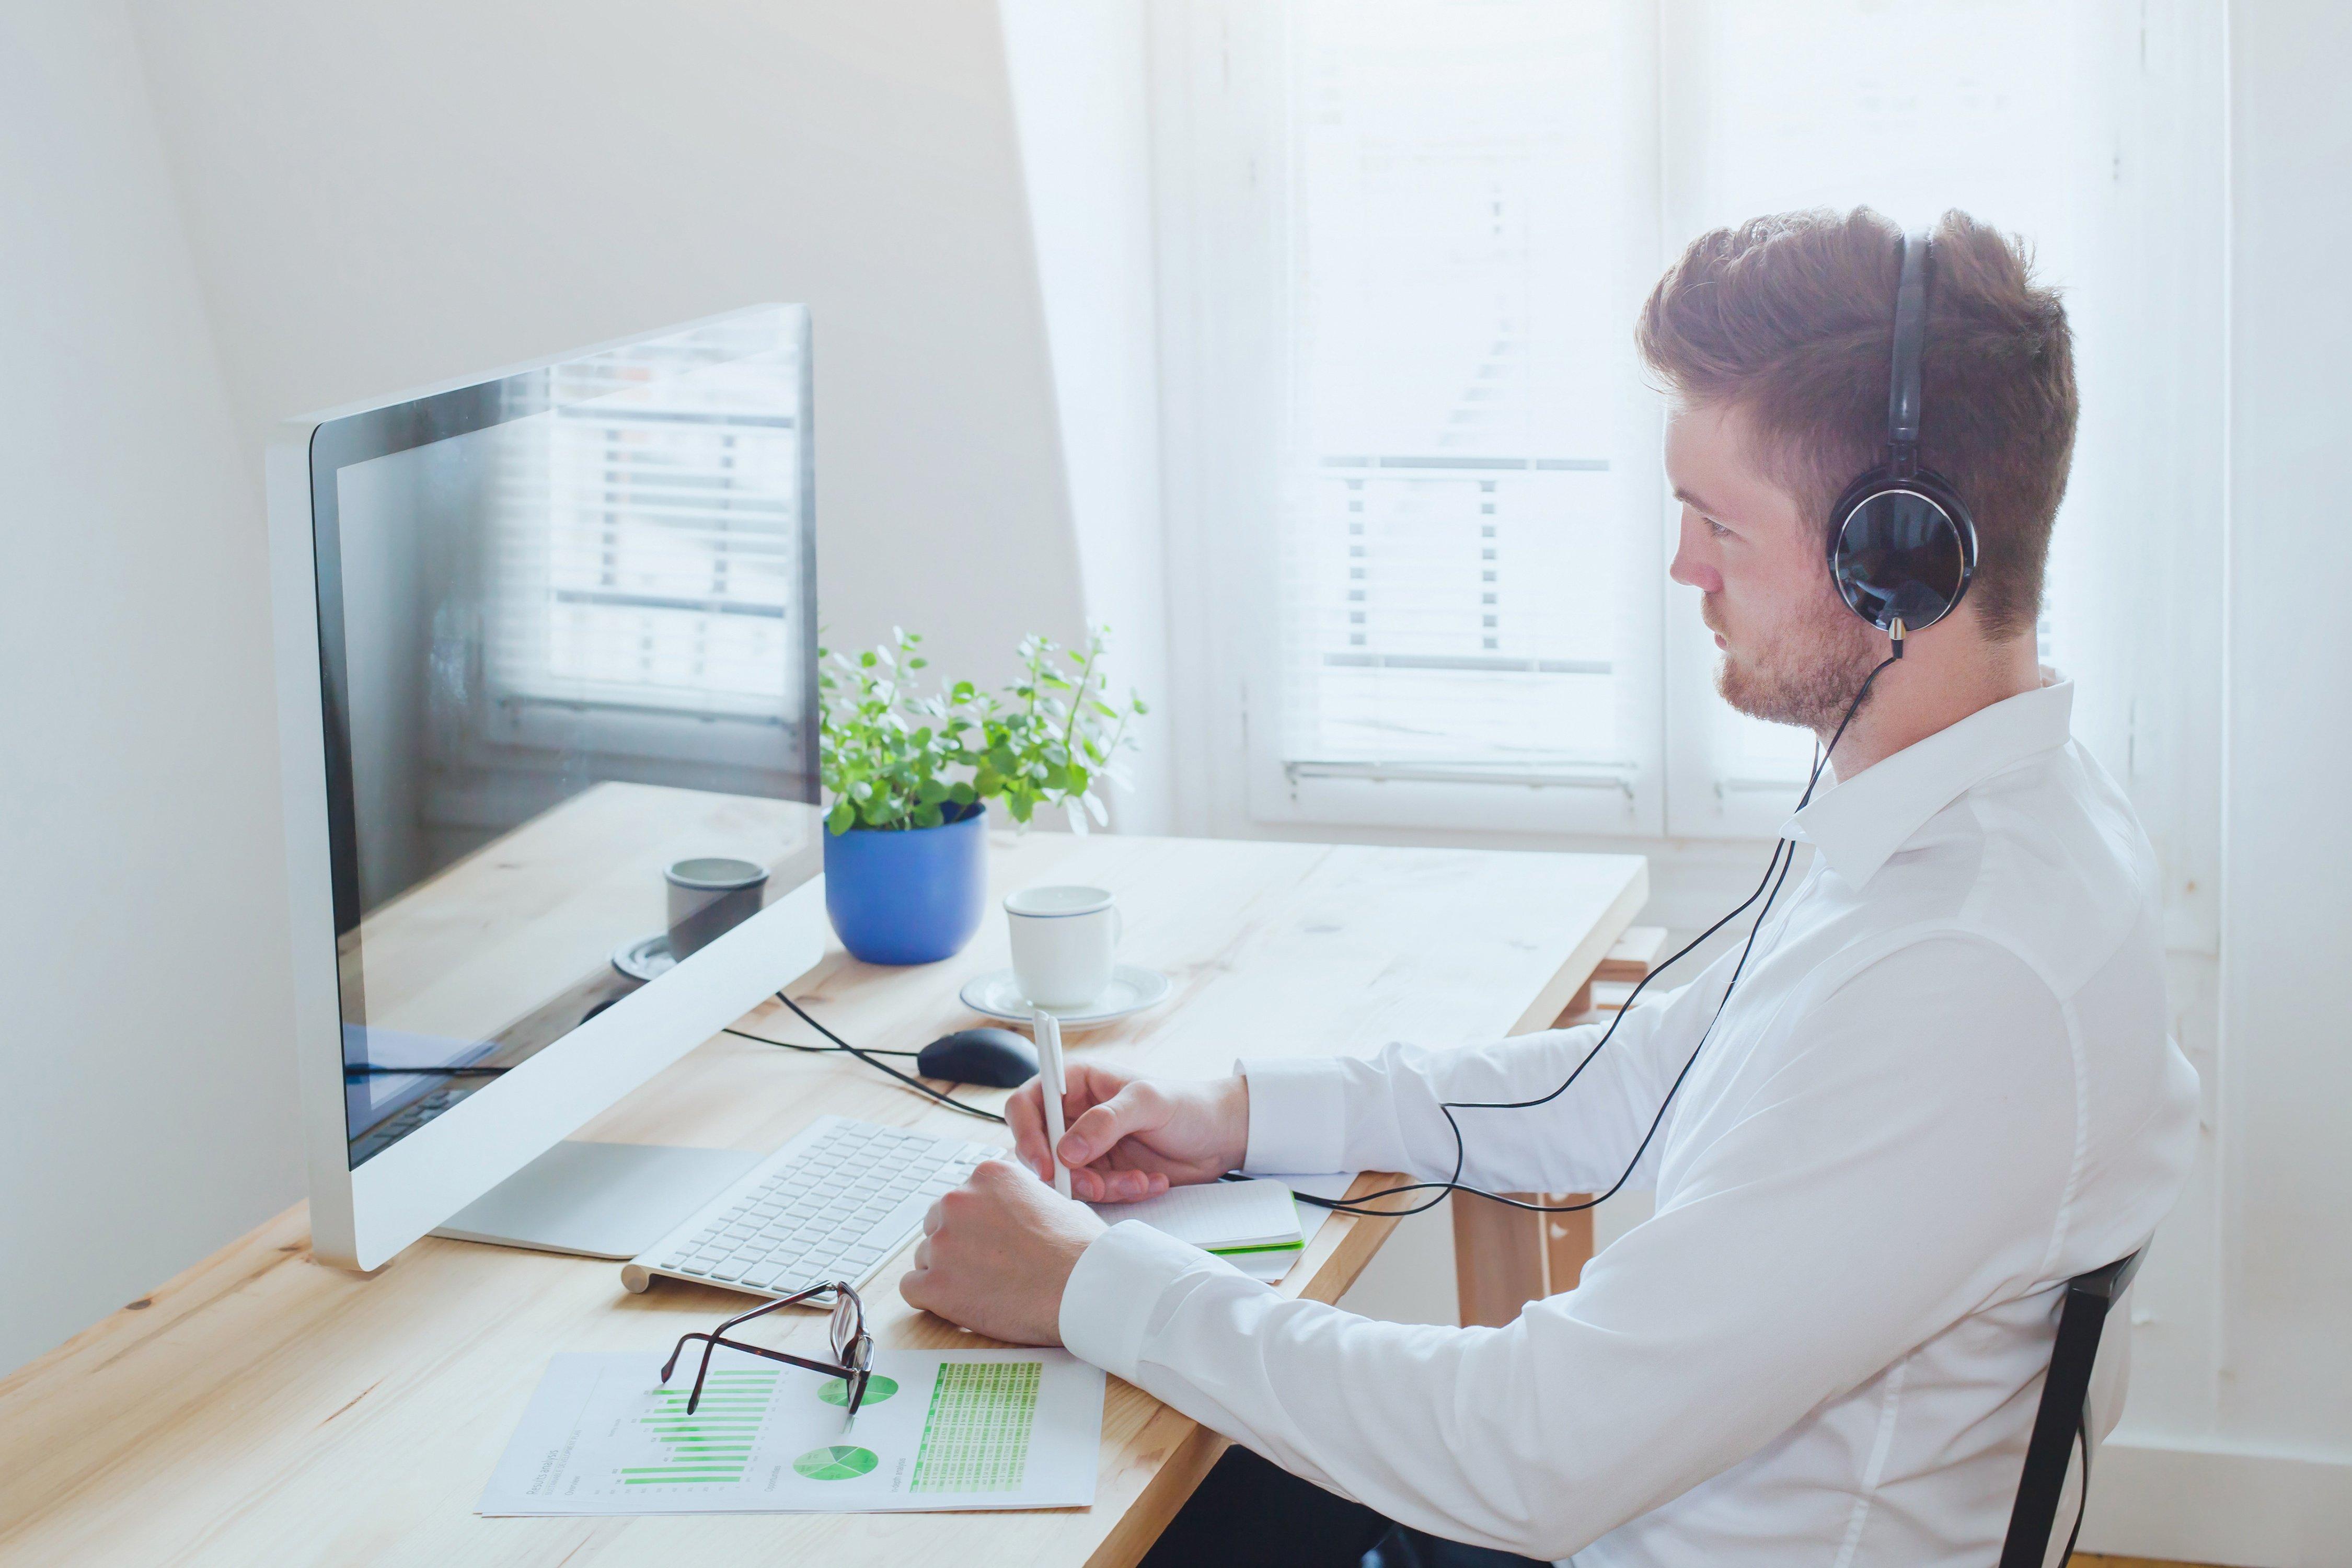 Man taking online training at desk